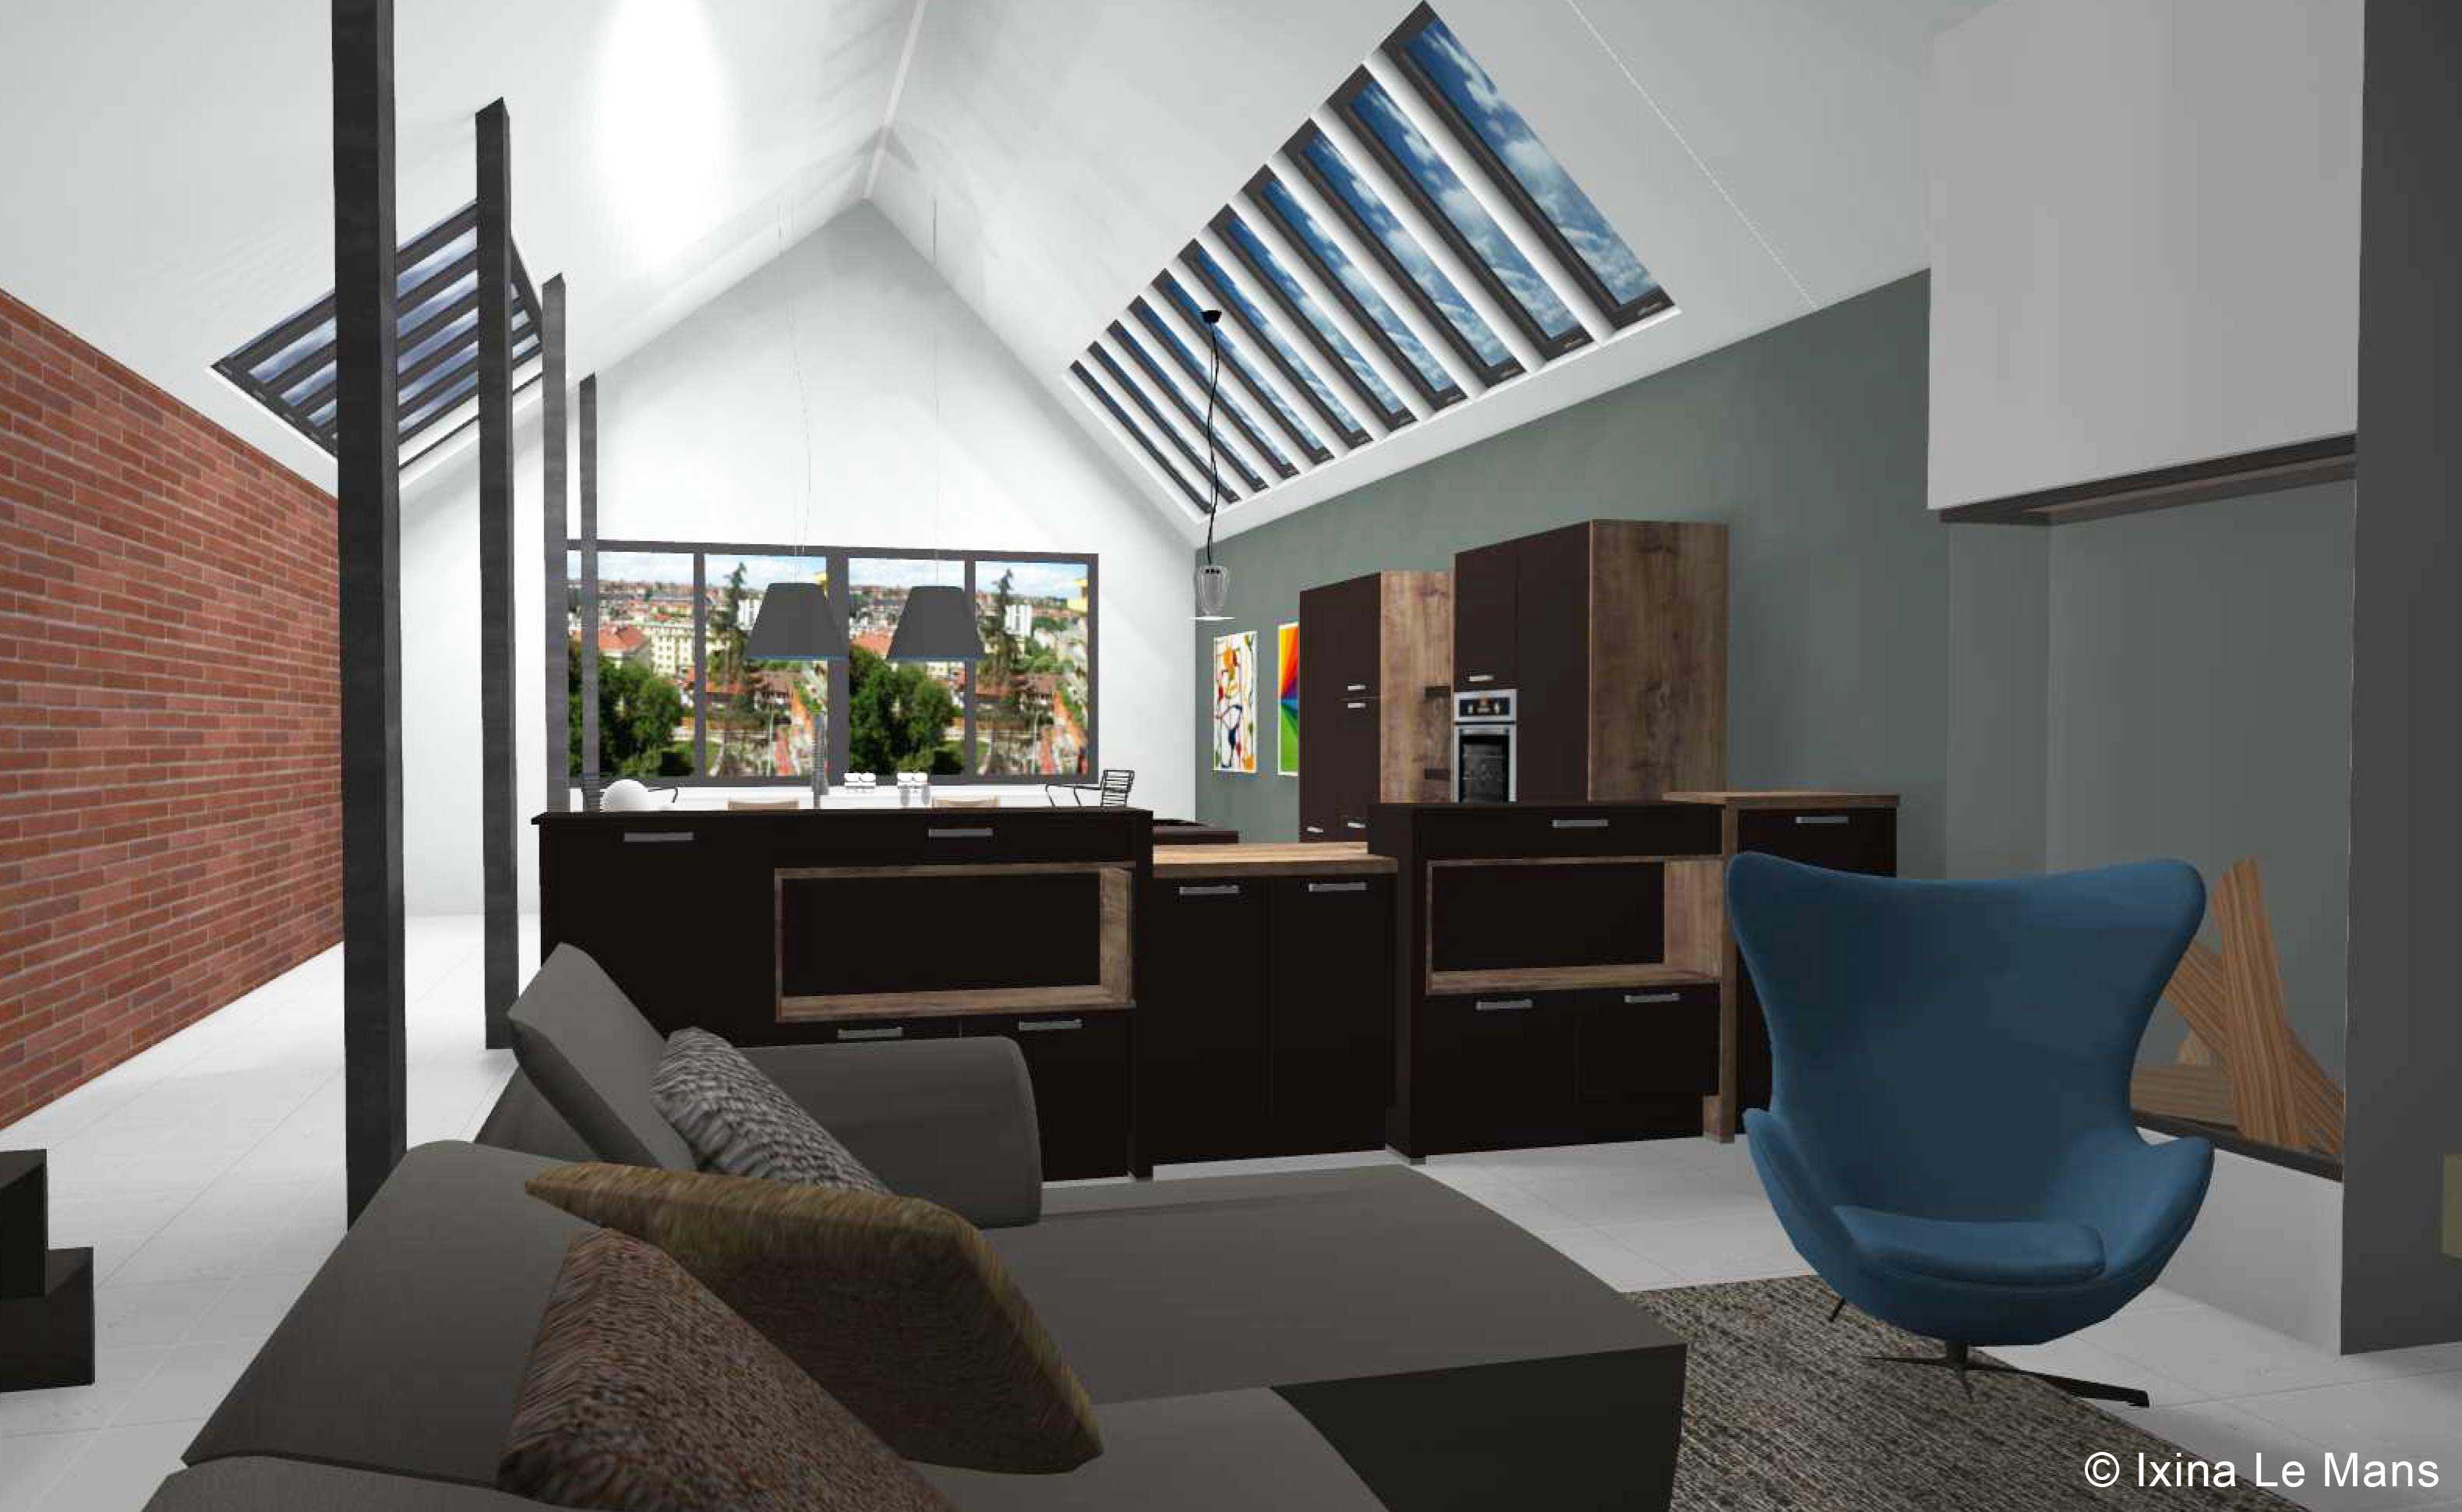 ixina beziers amazing top ralisation cuisine ixina tarcienne with ixina wiki with ixina beziers. Black Bedroom Furniture Sets. Home Design Ideas